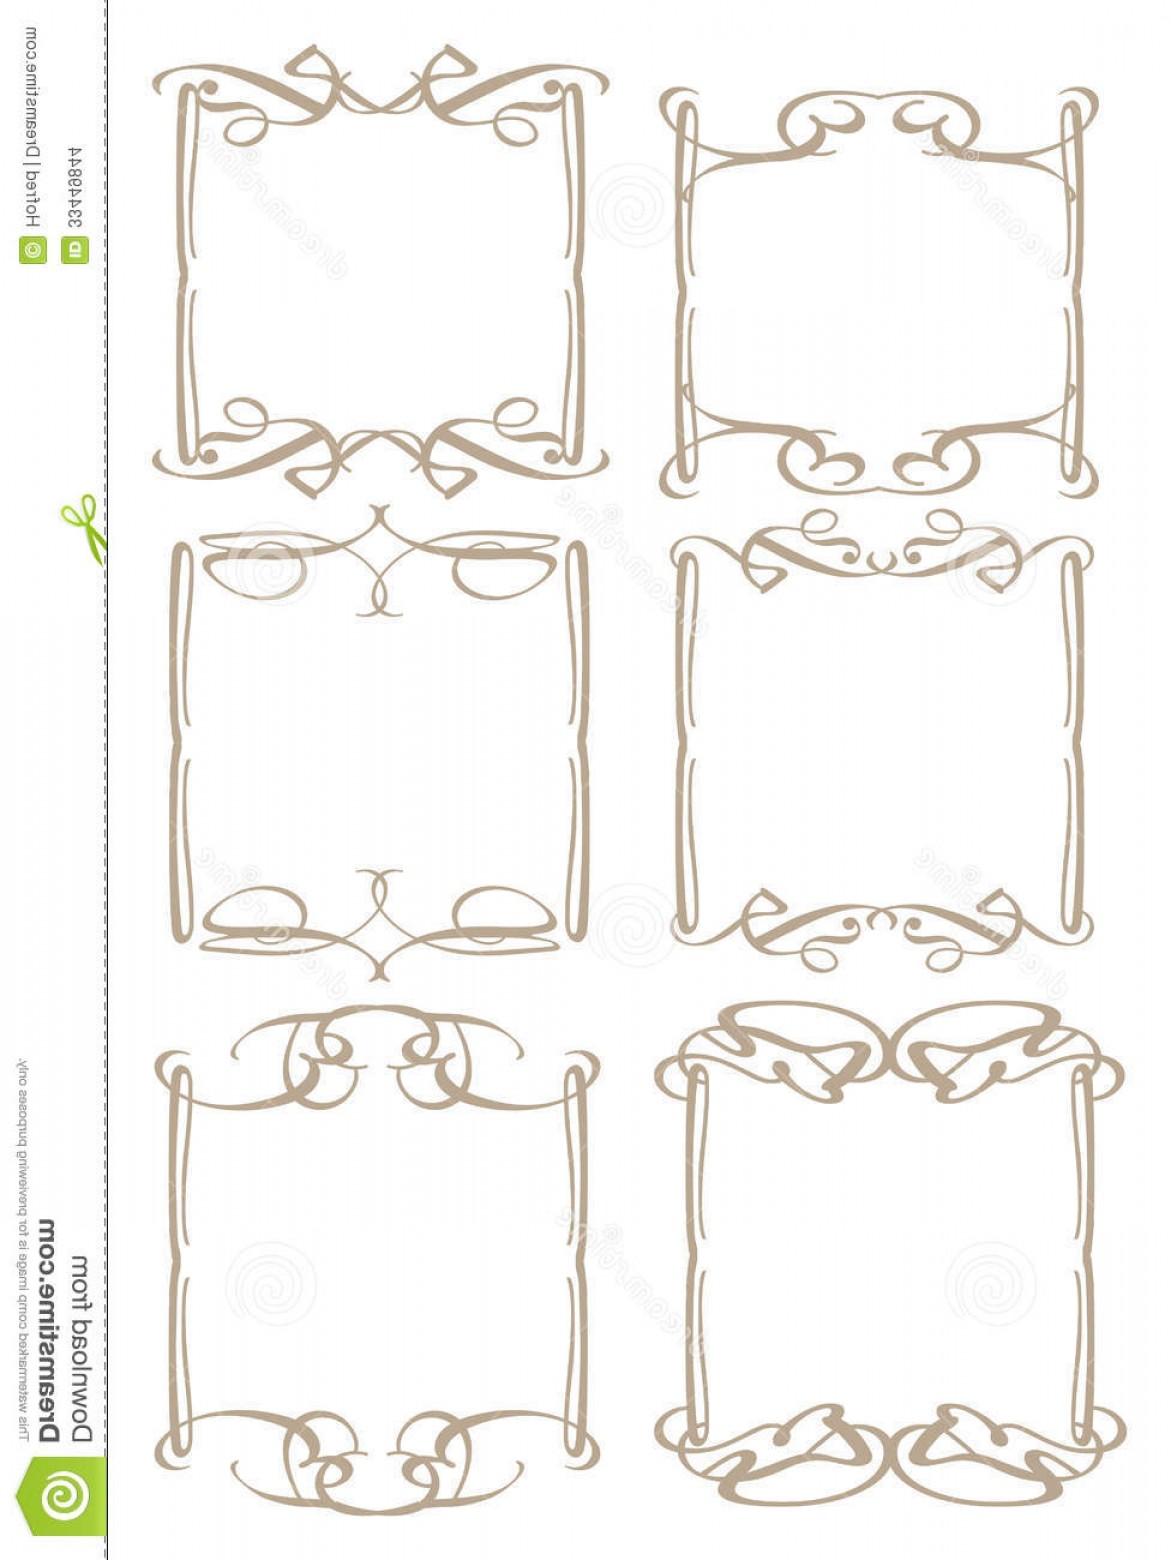 1171x1560 Stock Images Vintage Decorative Design Border Vector Borders